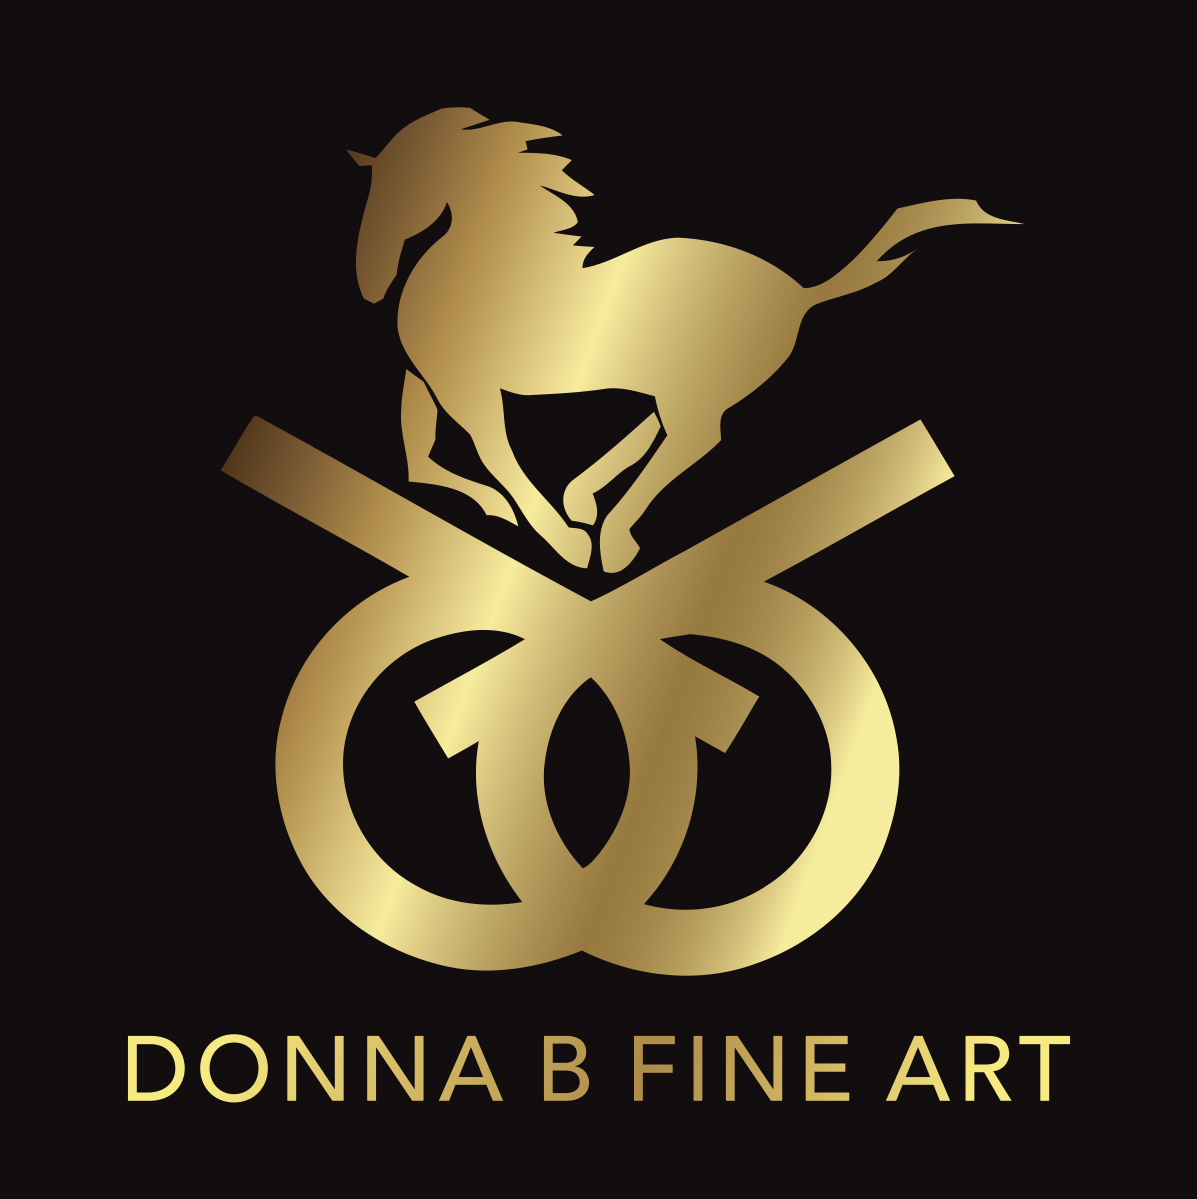 Donna B Fine Art on Facebook - \